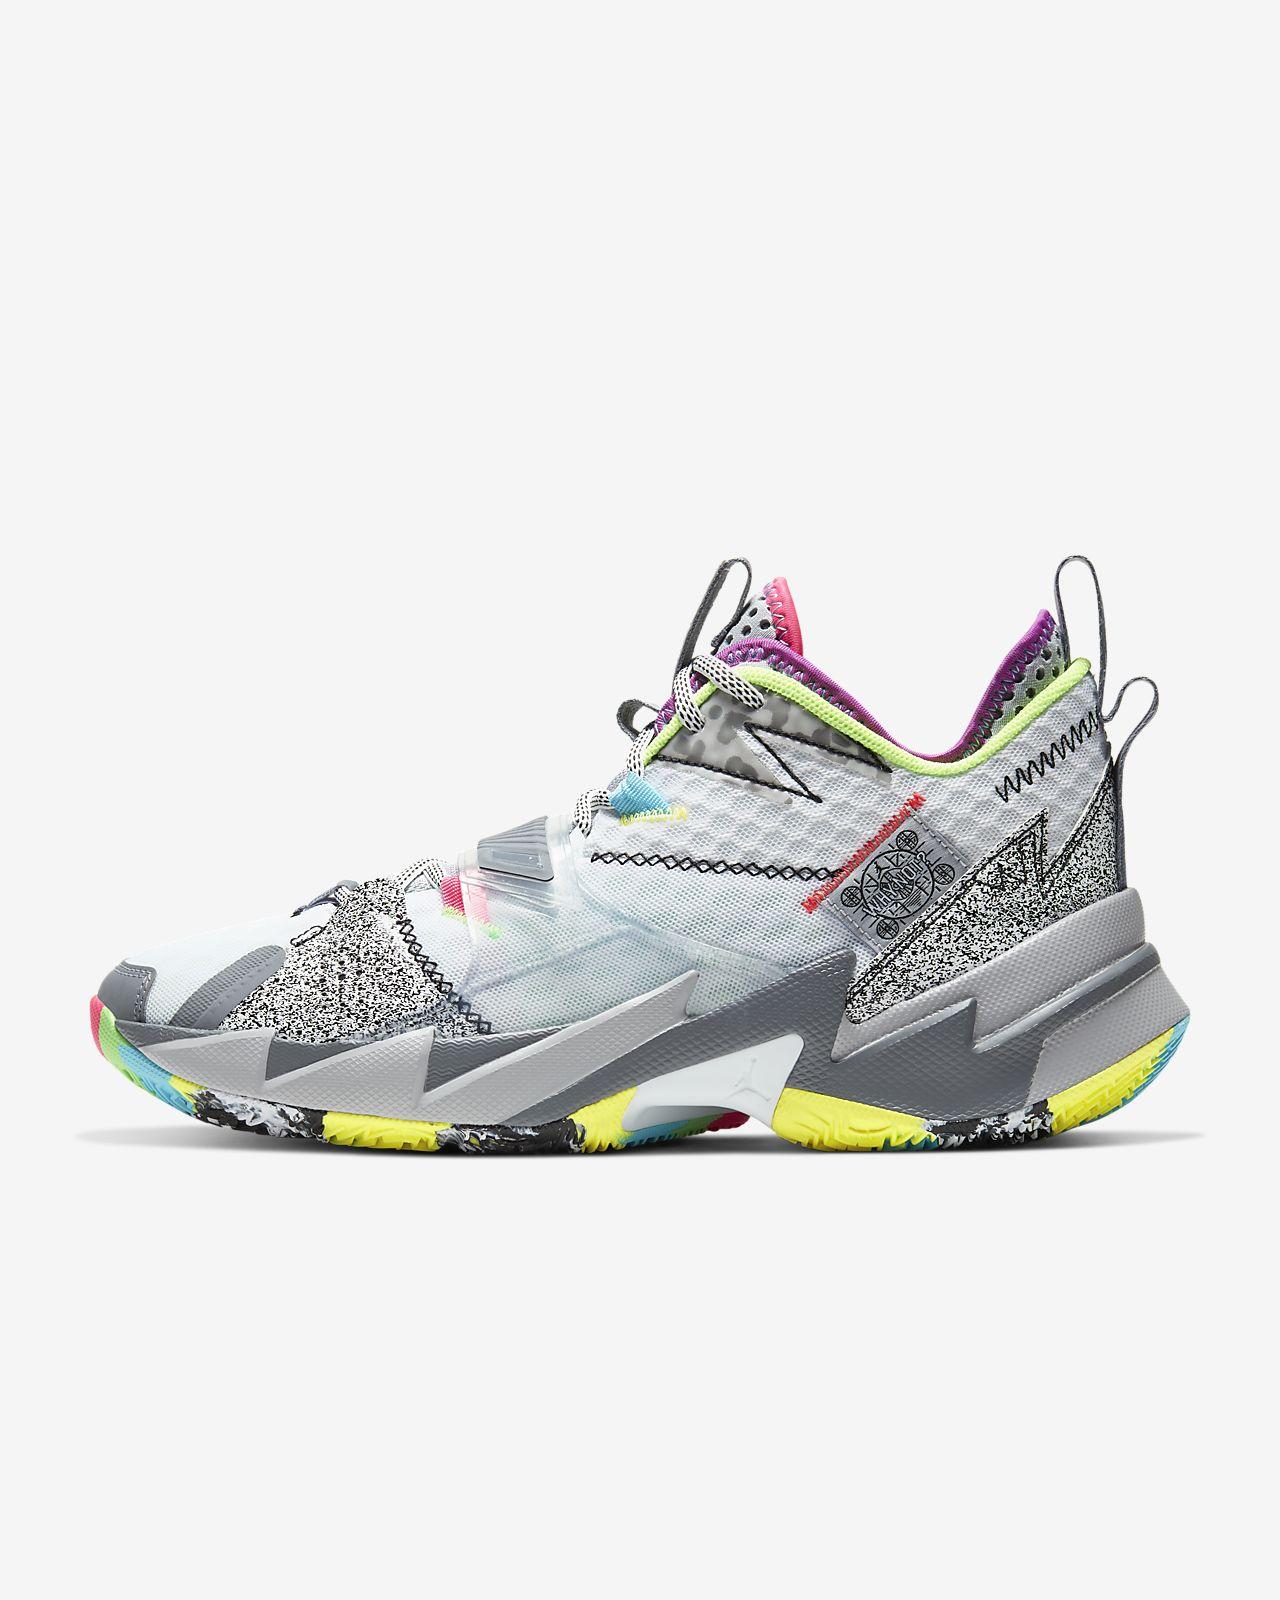 cupón granizo Espera un minuto  Jordan 'Why Not?' Zer0.3 Men's Basketball Shoe. Nike SK